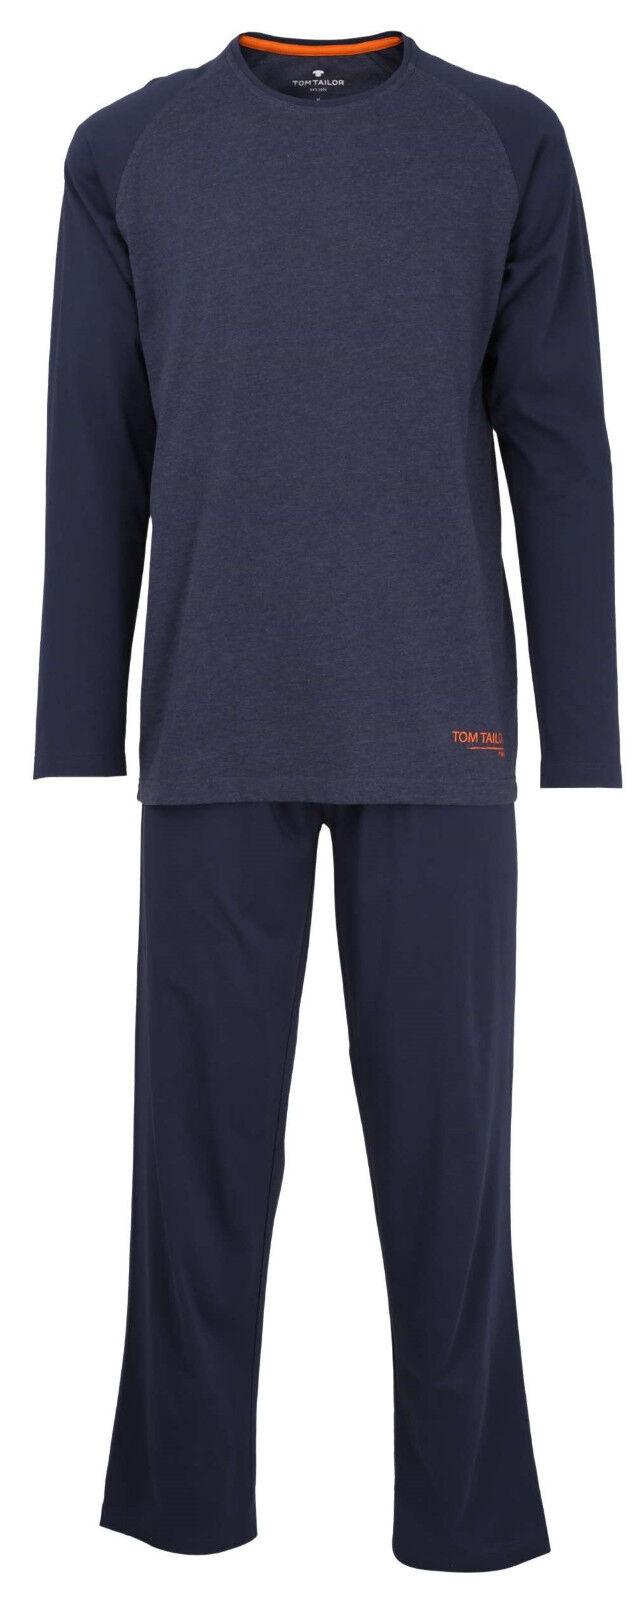 TOM TAILOR Schlafanzug Gr. XL/54 Jersey-Pyjama blau U-Ausschnitt Raglanärmel